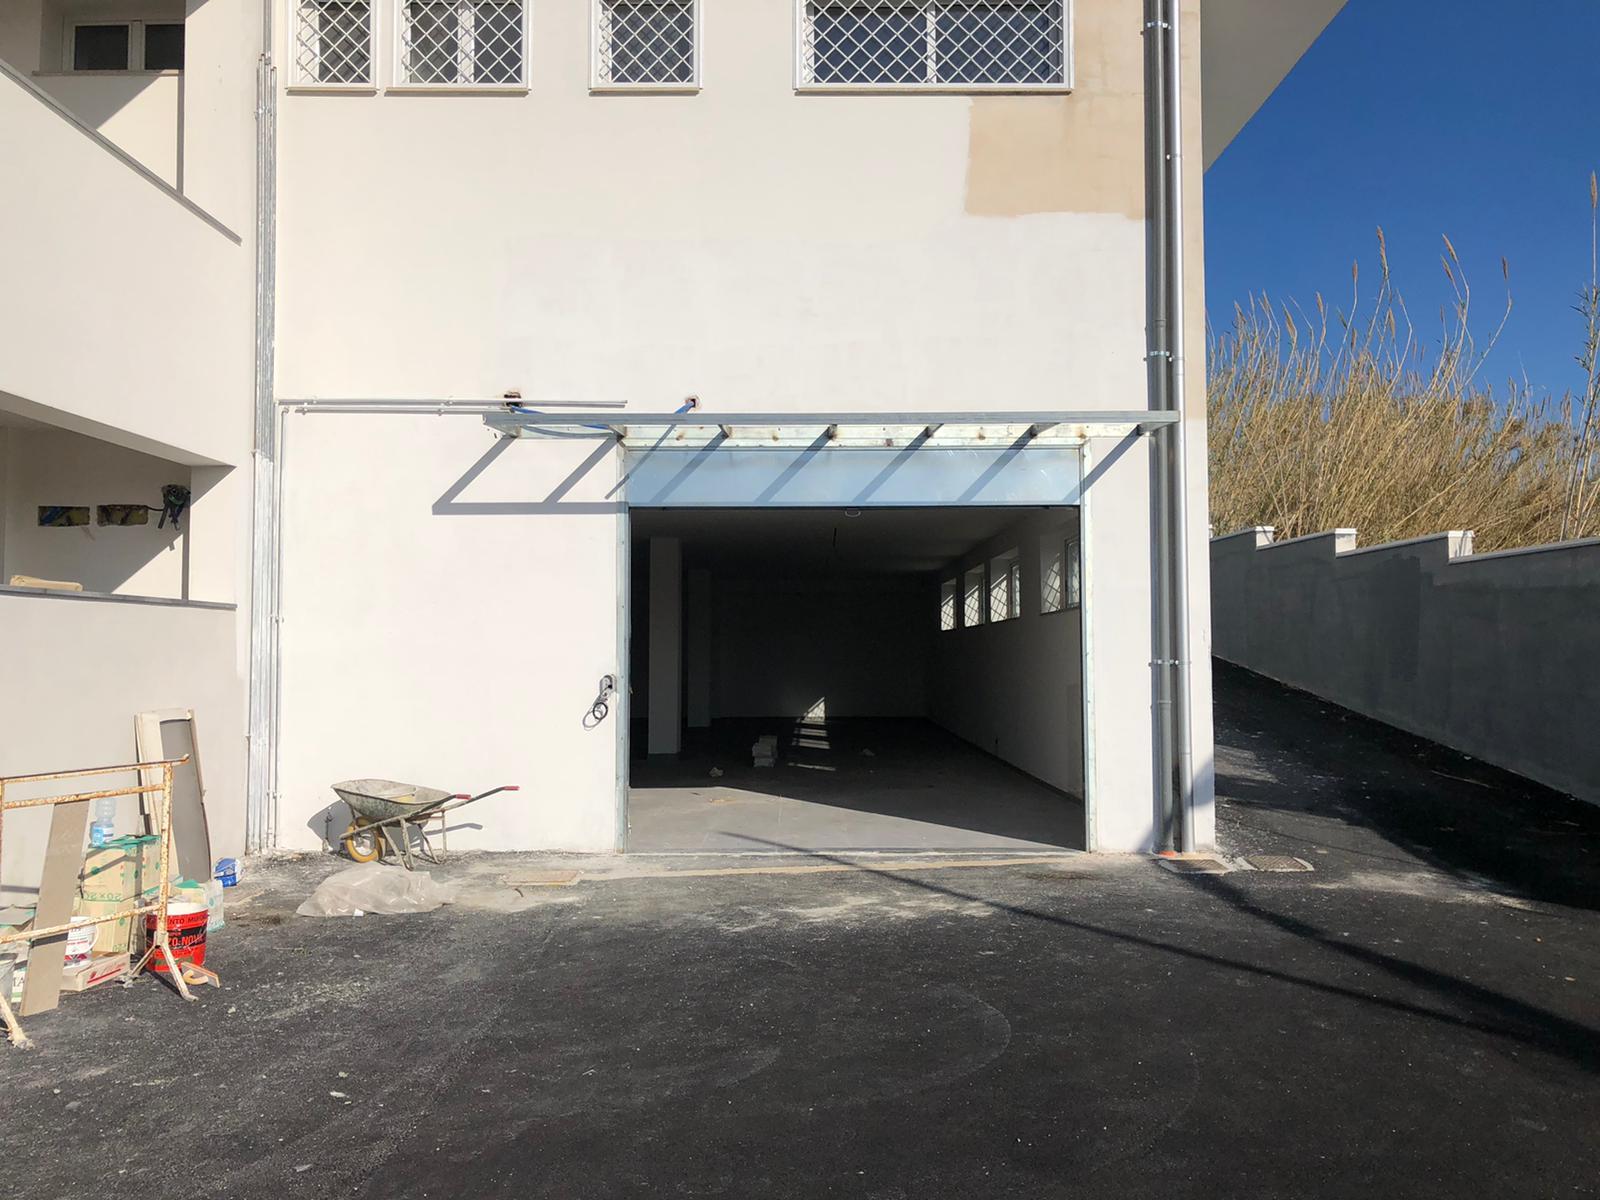 LOCALE COMMERCIALE Varcaturo Centro Rif 35942